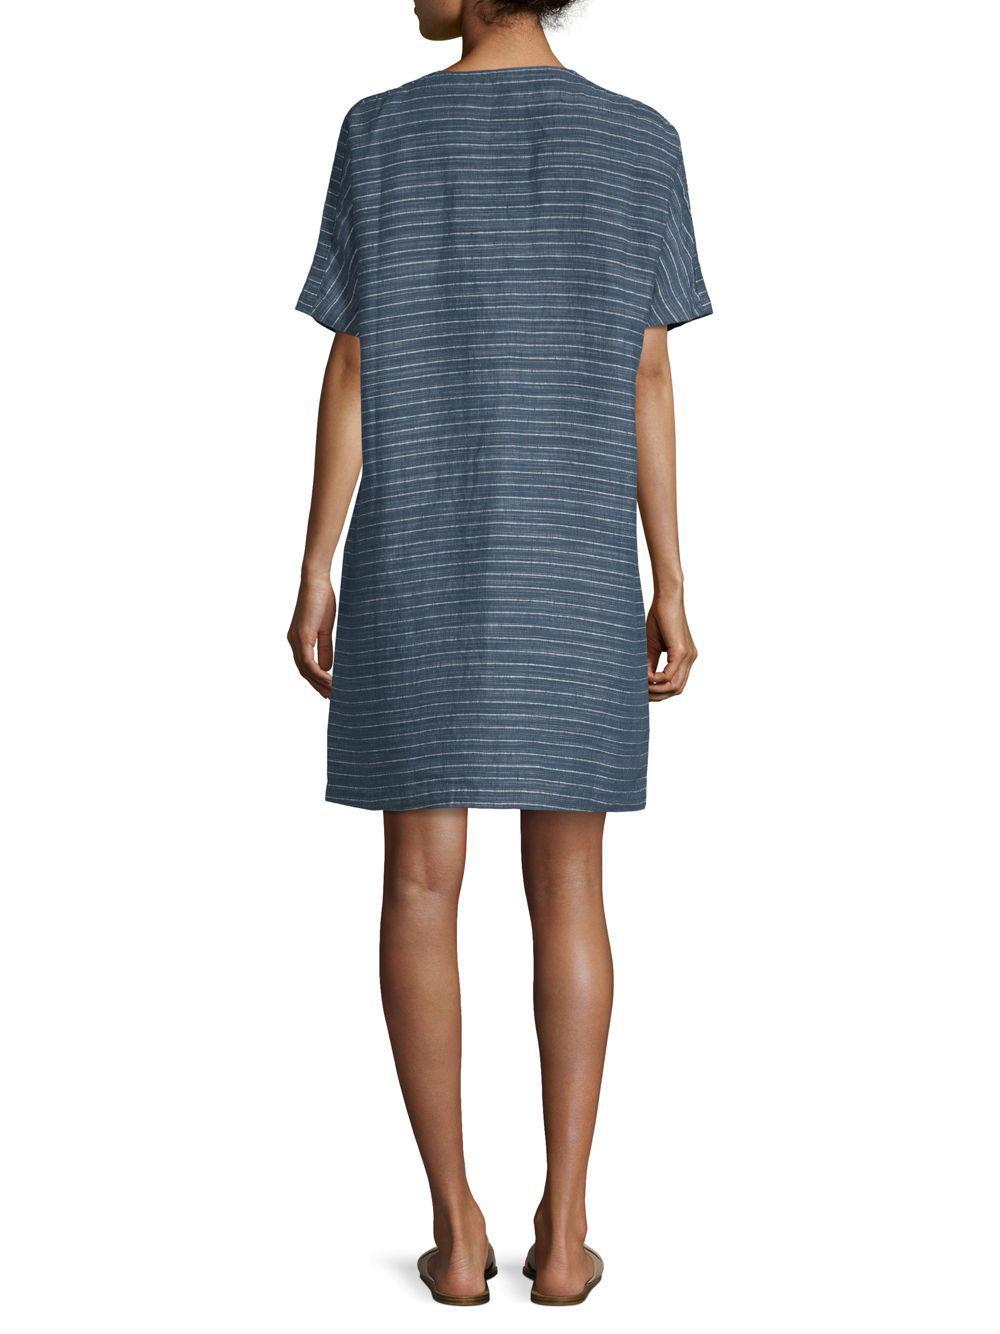 664eb92172 Eileen Fisher - Blue Striped Linen Tunic Dress - Lyst. View fullscreen